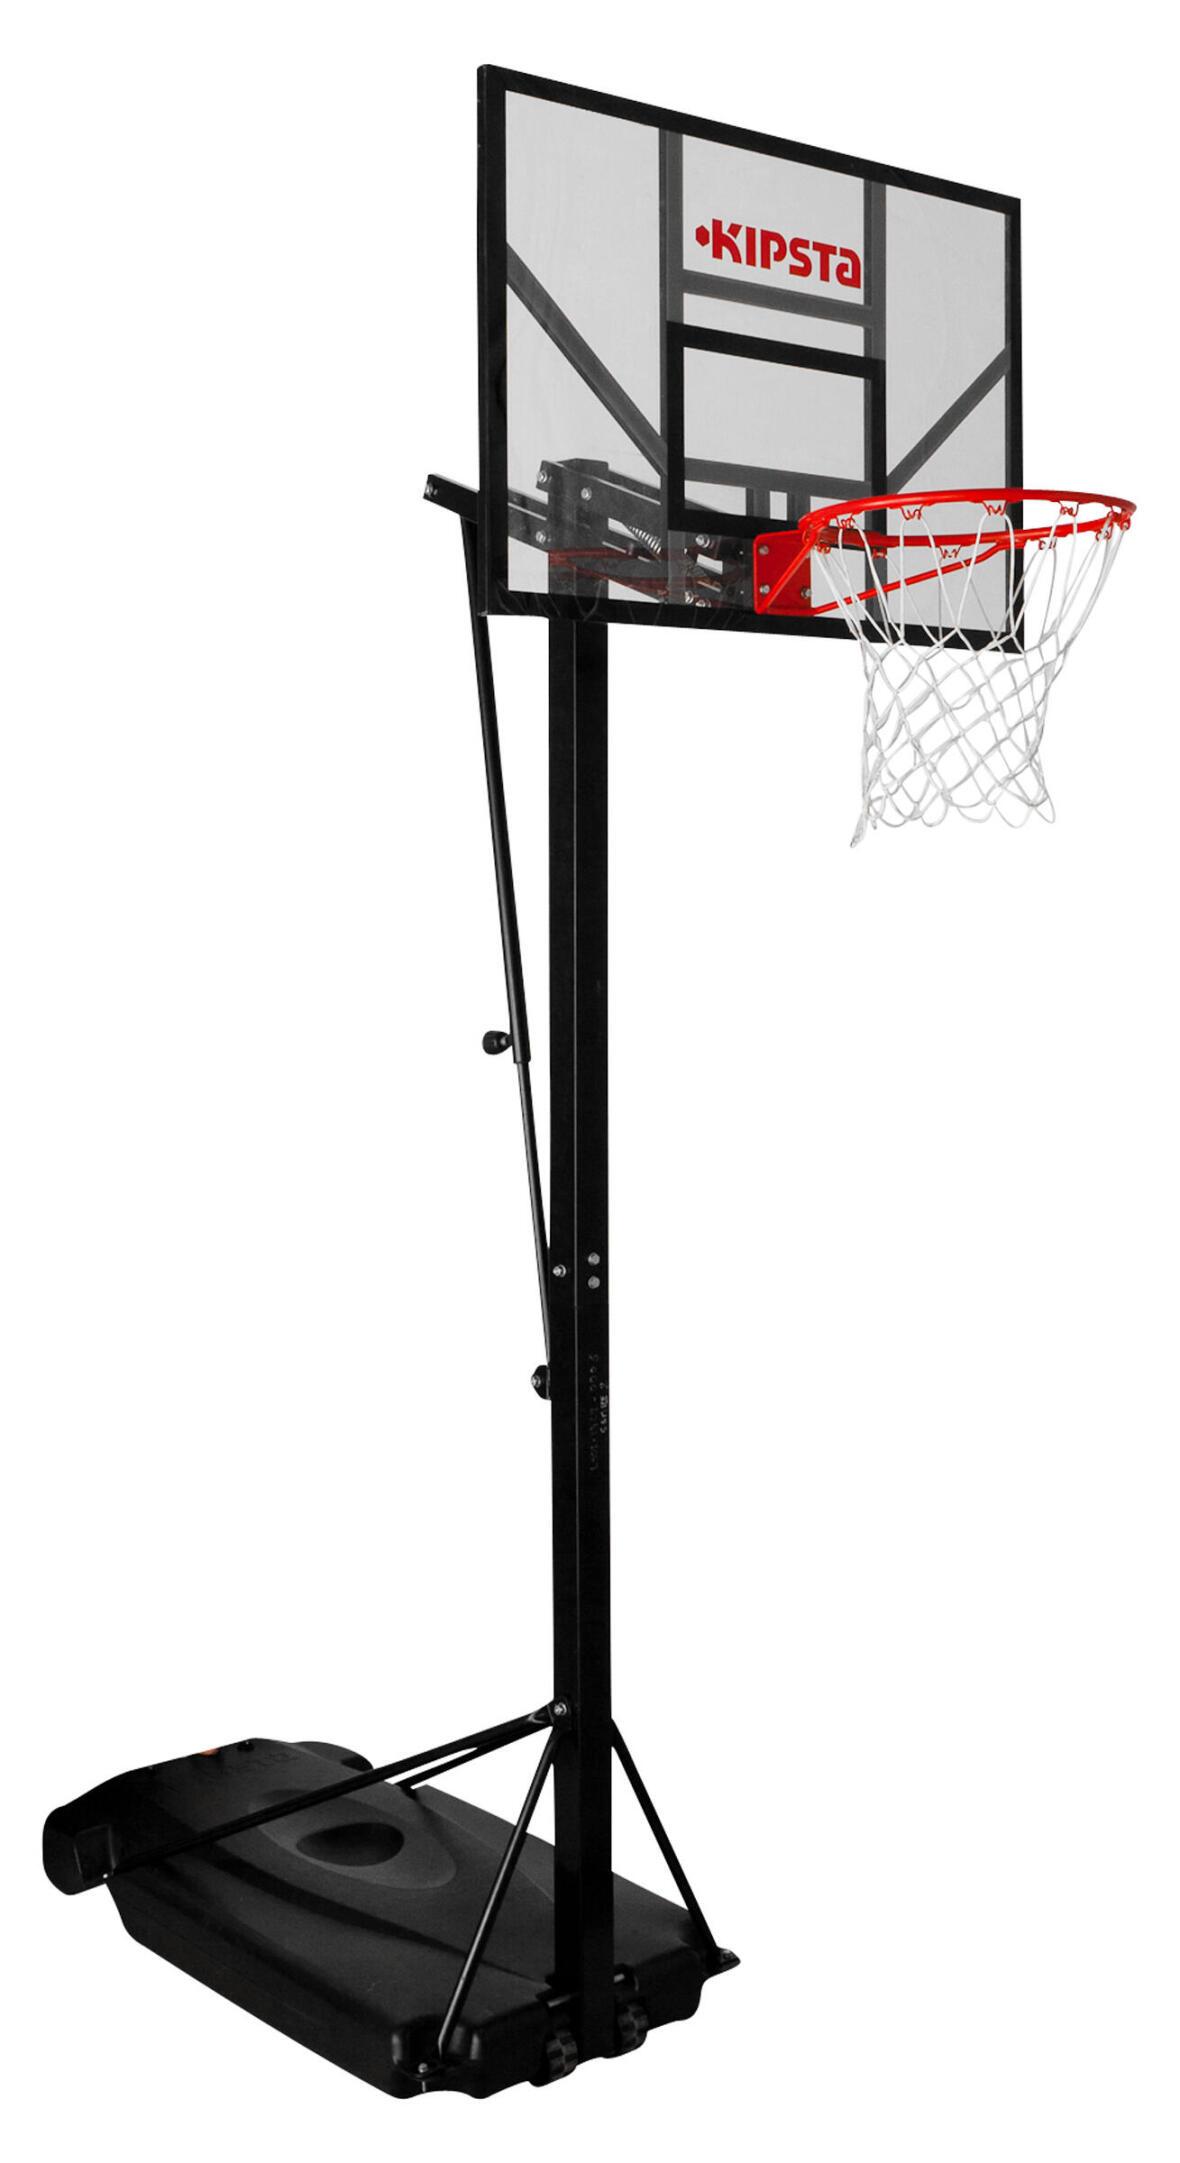 tabela-de-basquetebol-b-700-decathlon-tarmak